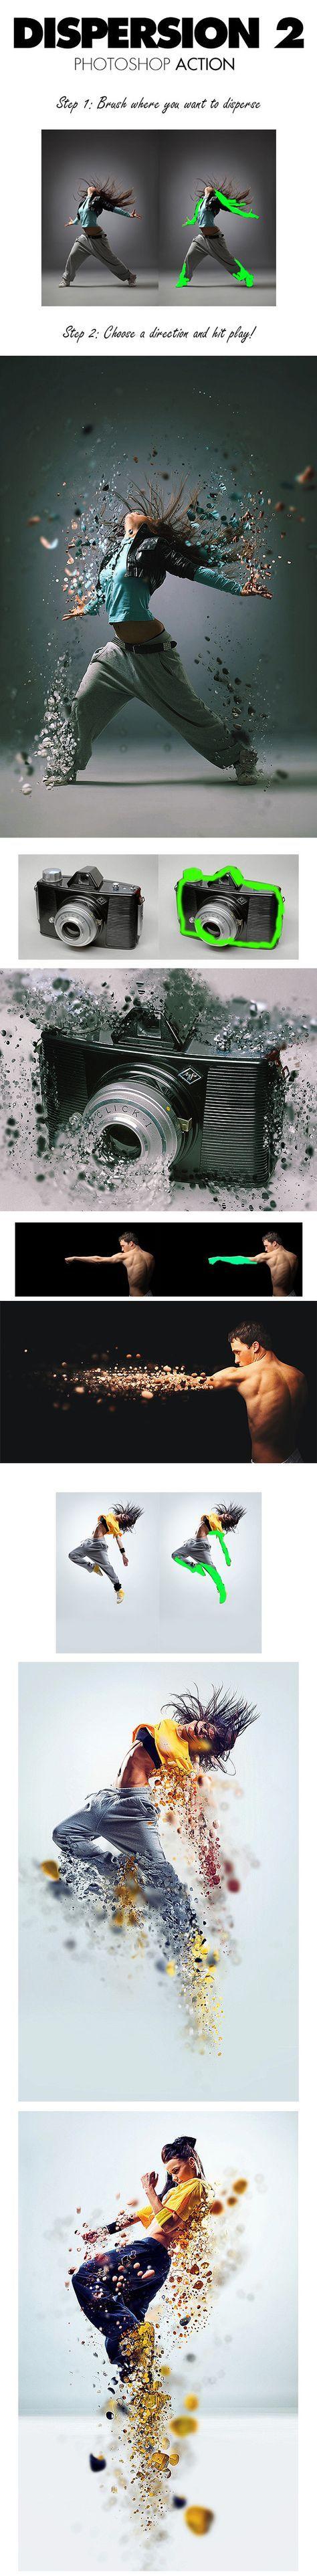 6-Dispersion 2 Photoshop Action